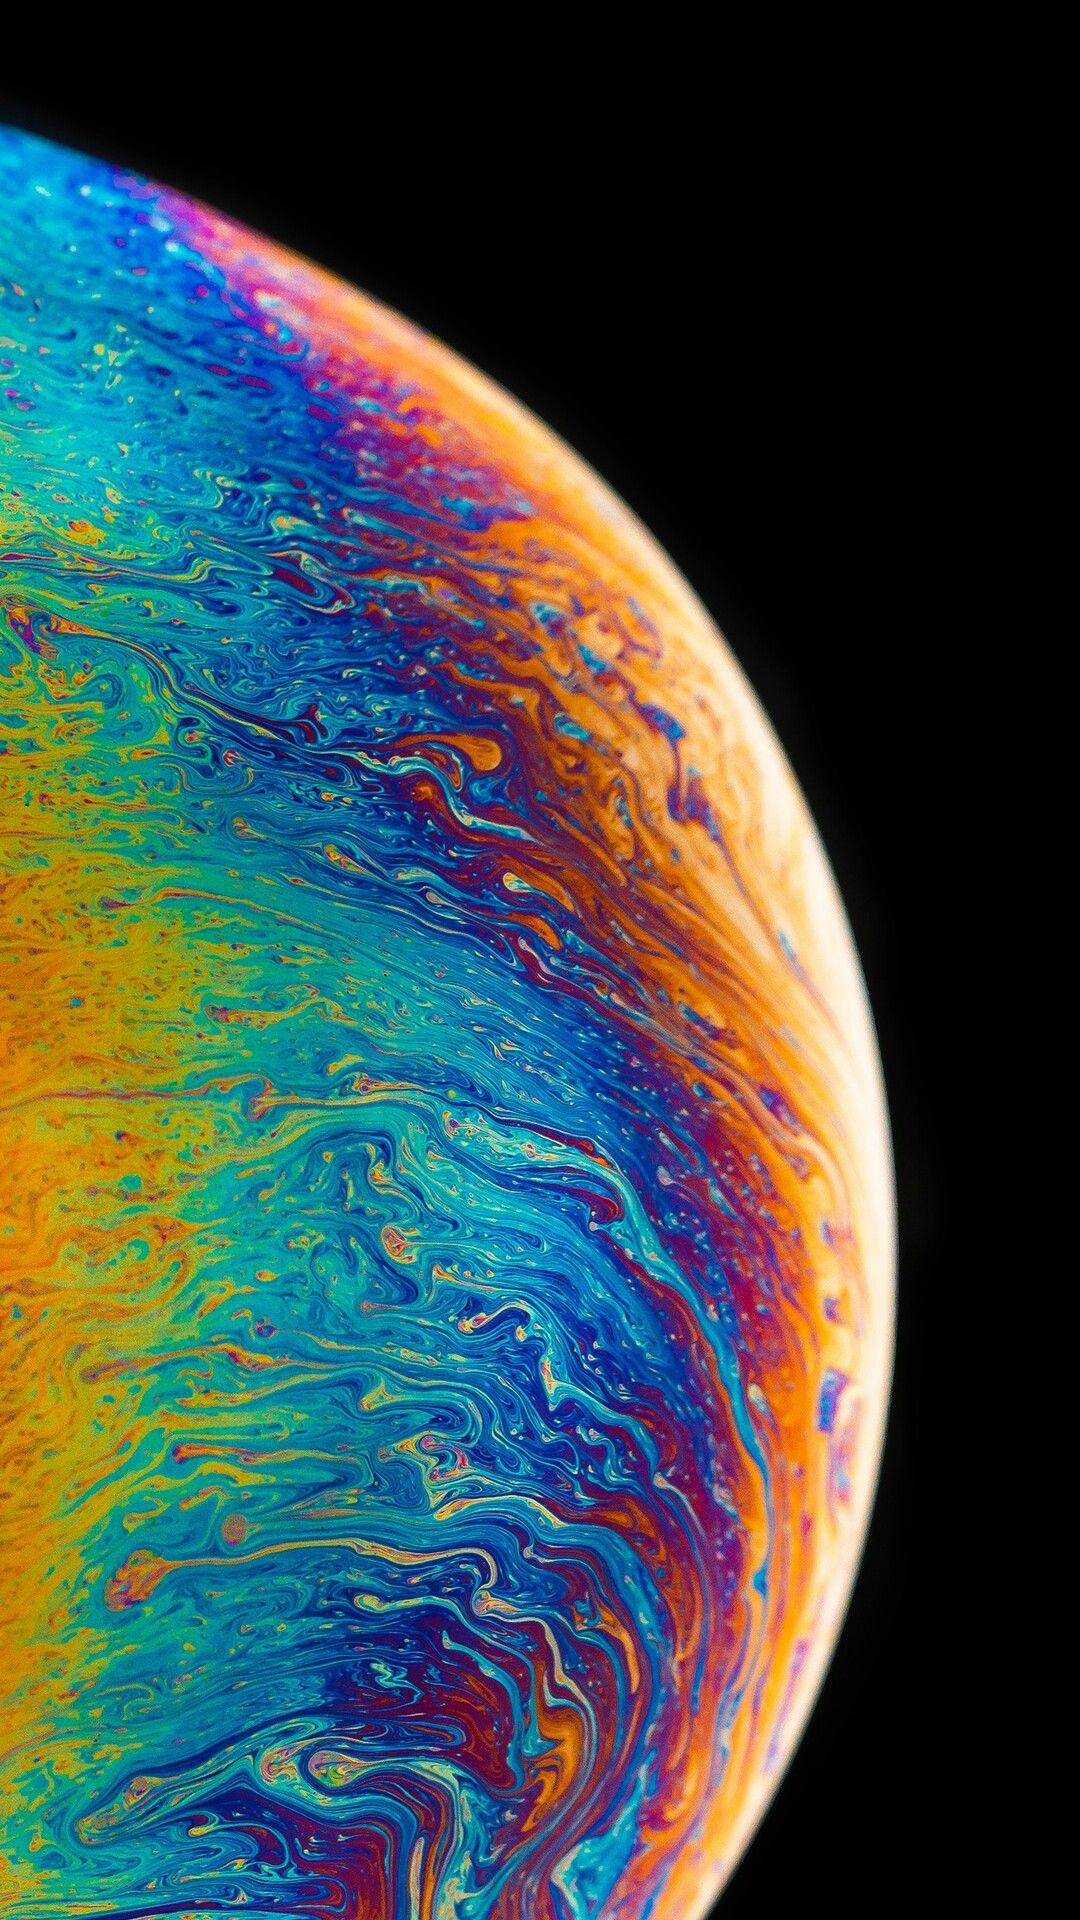 Iphone X Default Wallpapers - Wallpaper Cave